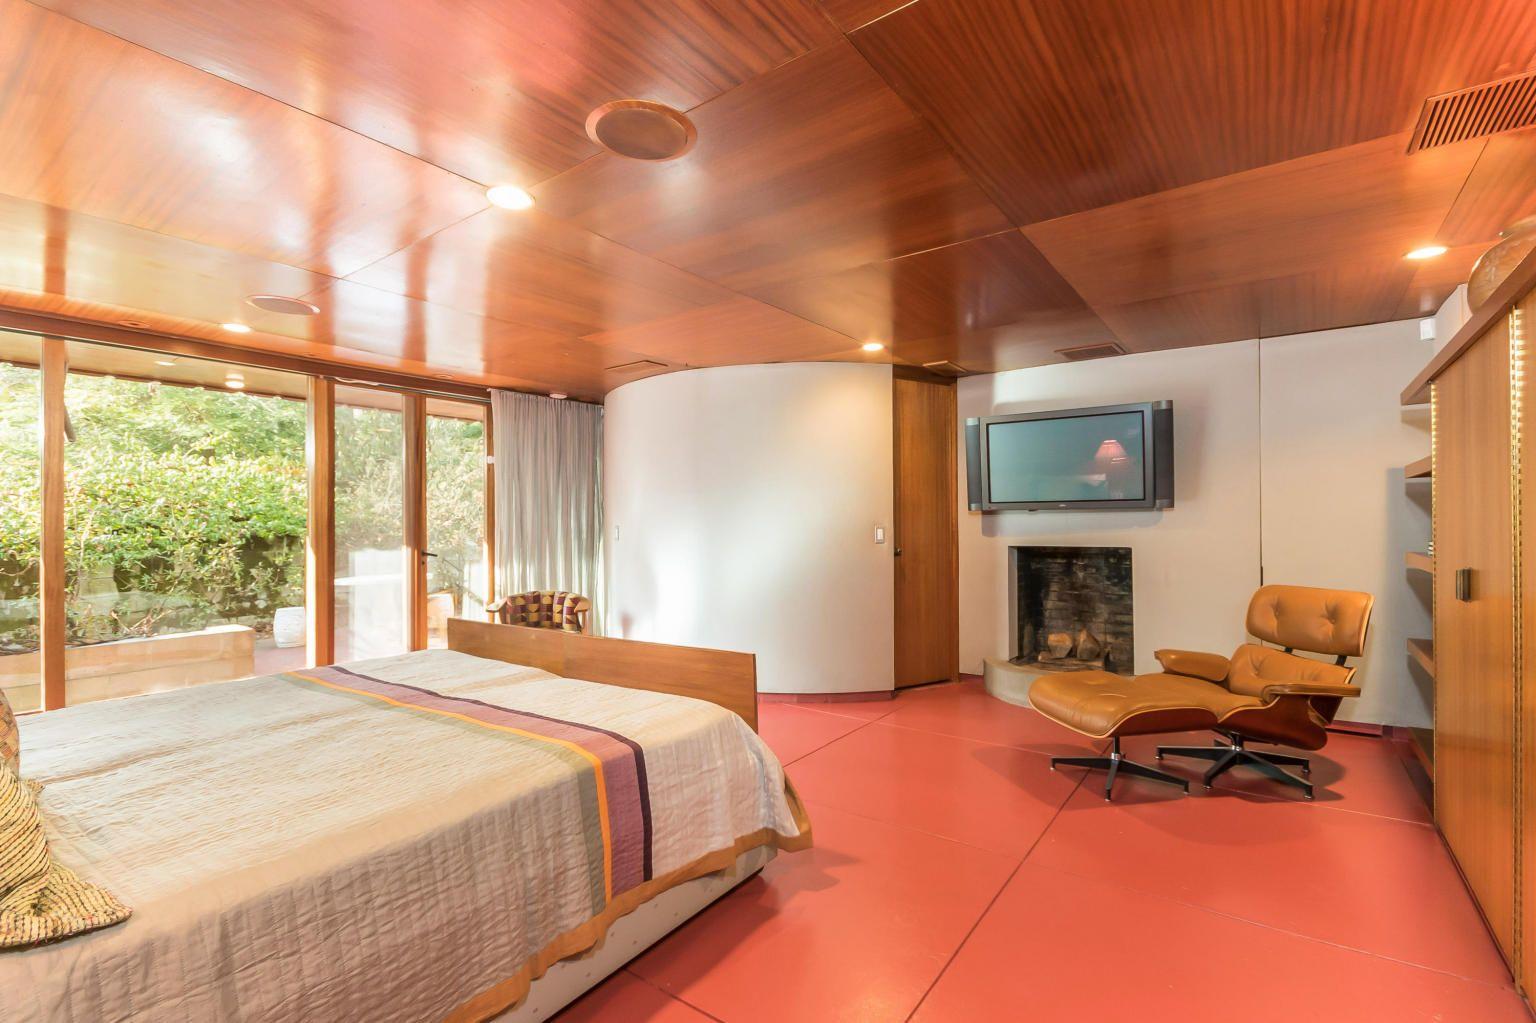 own frank lloyd wright 39 s horseshoe shaped tirranna home. Black Bedroom Furniture Sets. Home Design Ideas